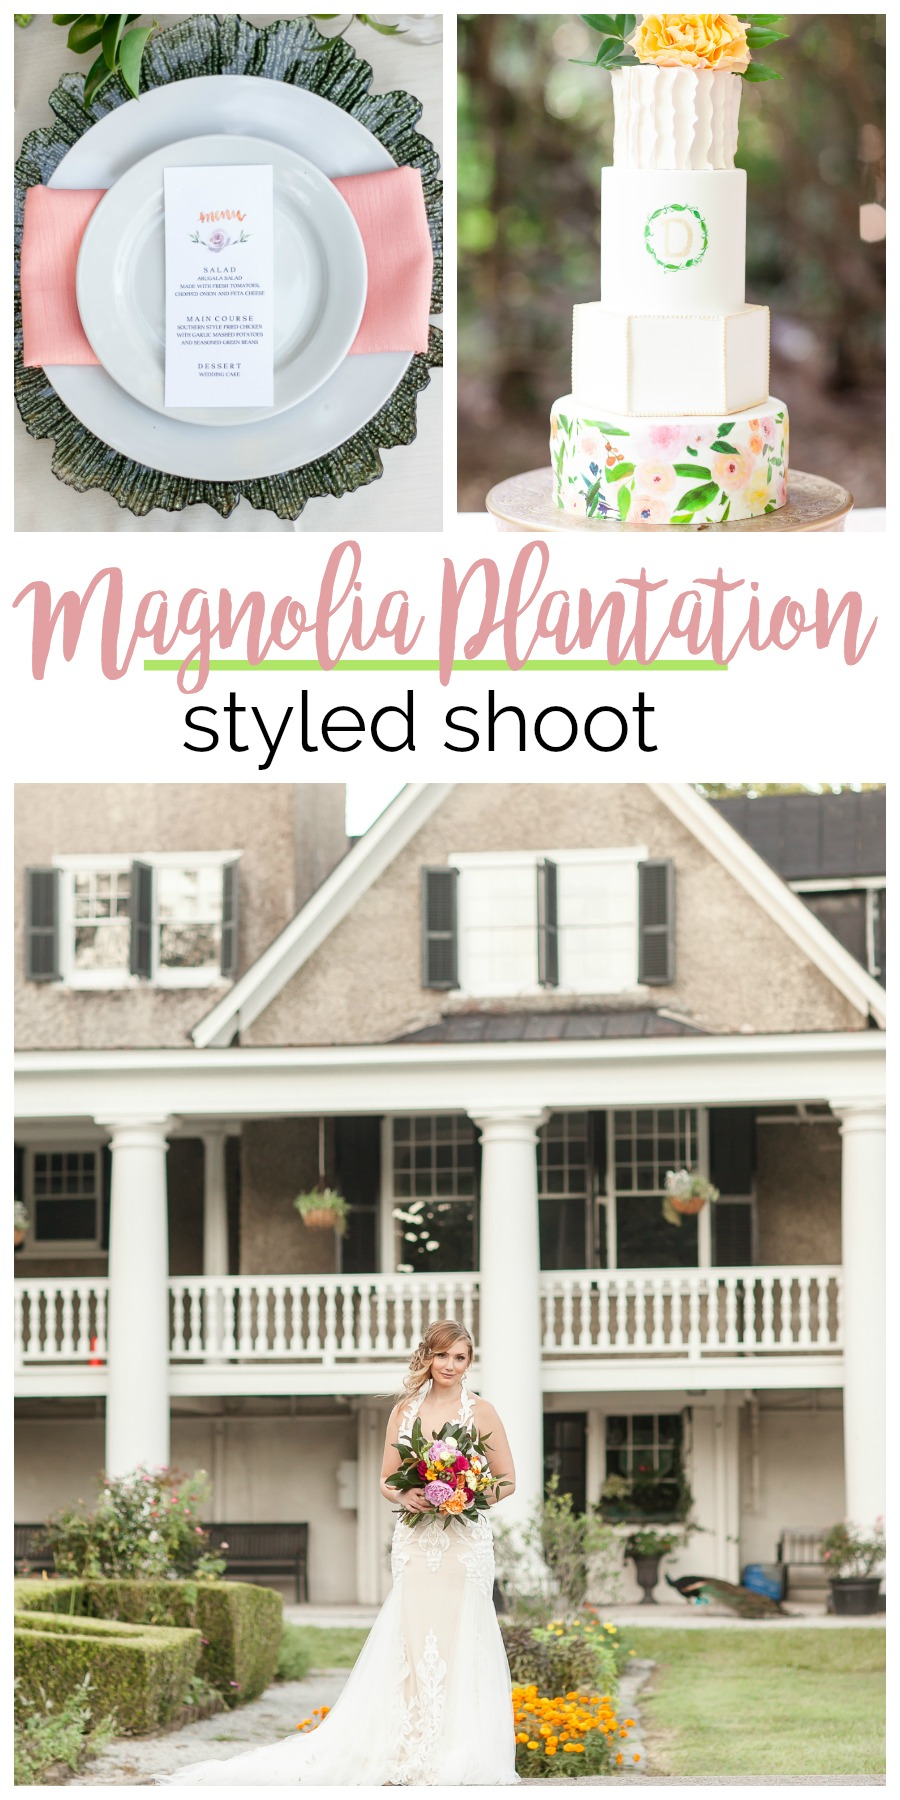 Wedding Inspiration: Magnolia Plantation Styled Shoot, Charleston, South Carolina | Palmetto State Weddings